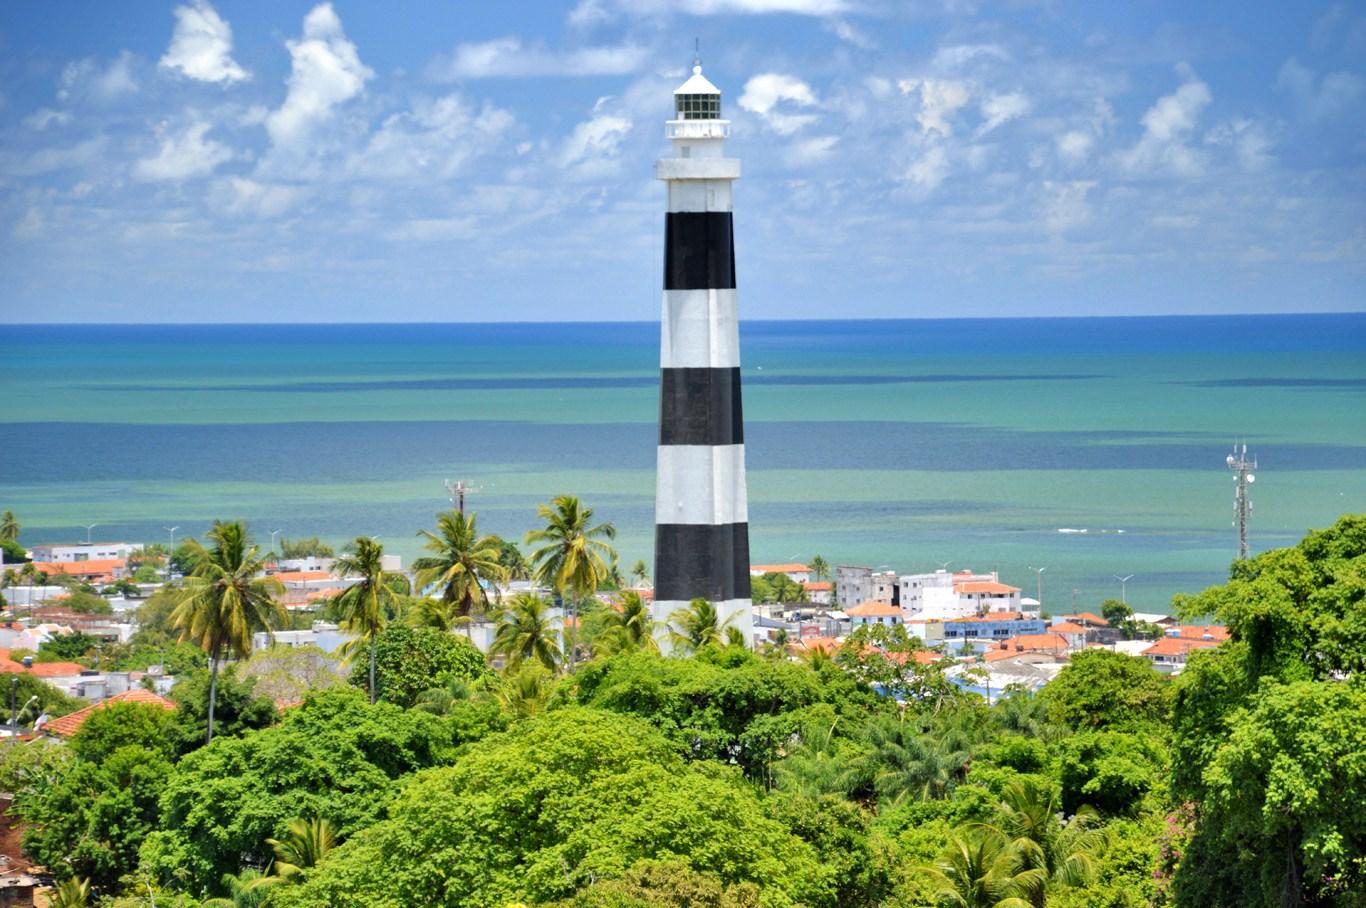 The lighthouse in Olinda